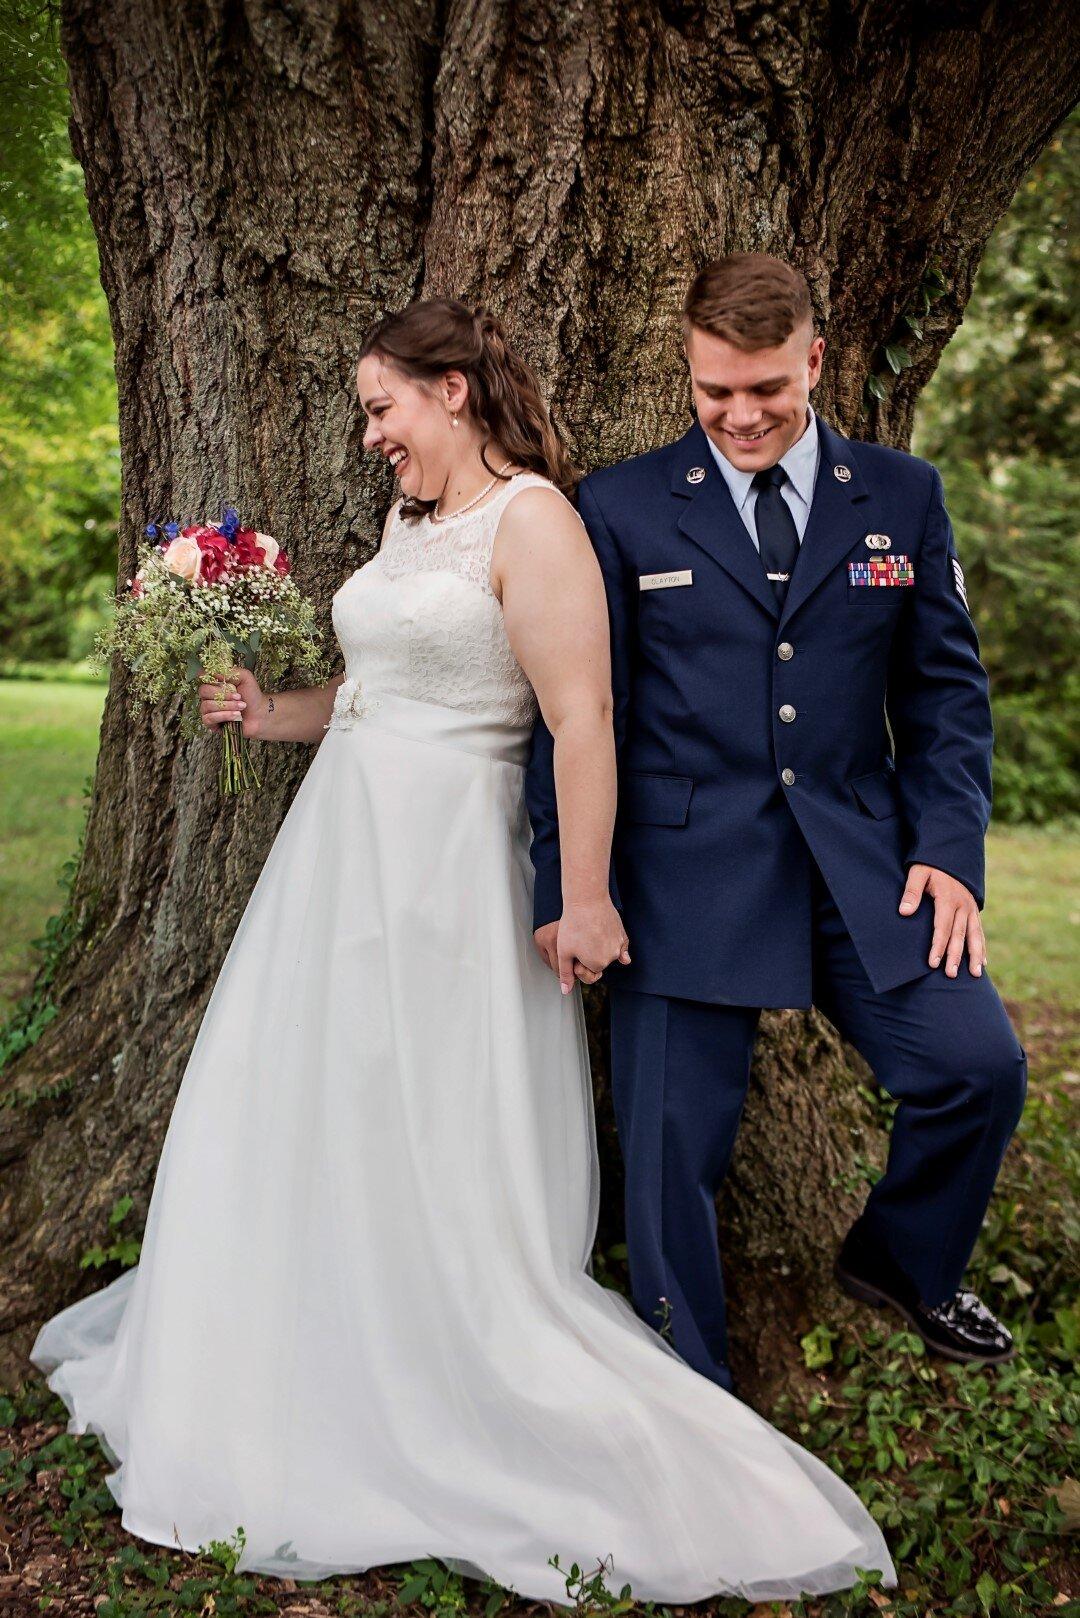 Courtney+Brendon_2019_Wedding_25RMS_2733.jpg